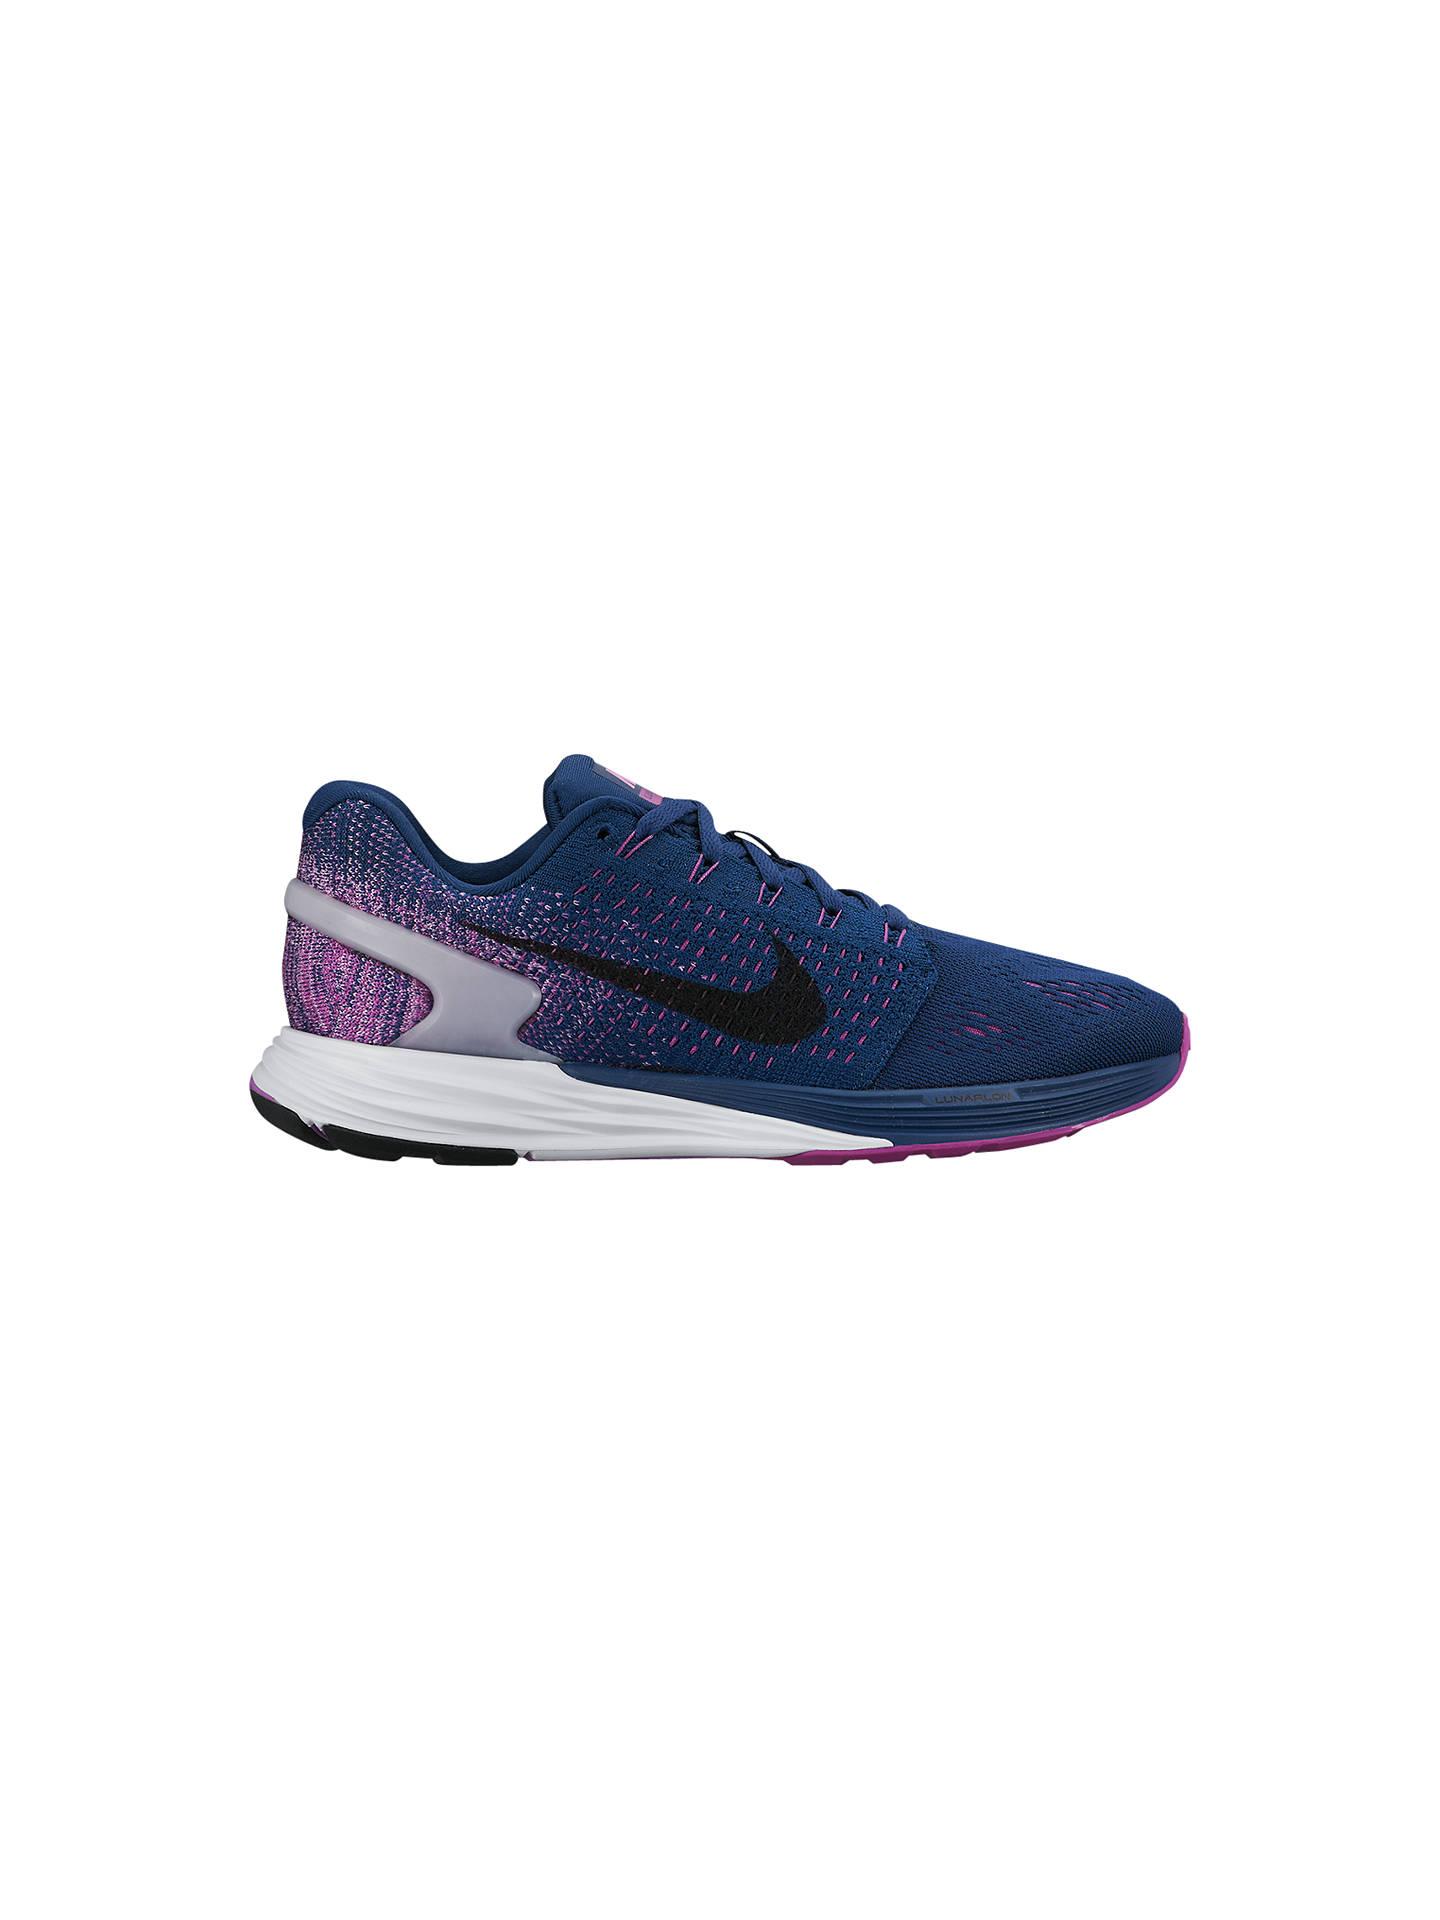 medio litro Susurro asignar  Nike LunarGlide 7 Women's Running Shoes at John Lewis & Partners